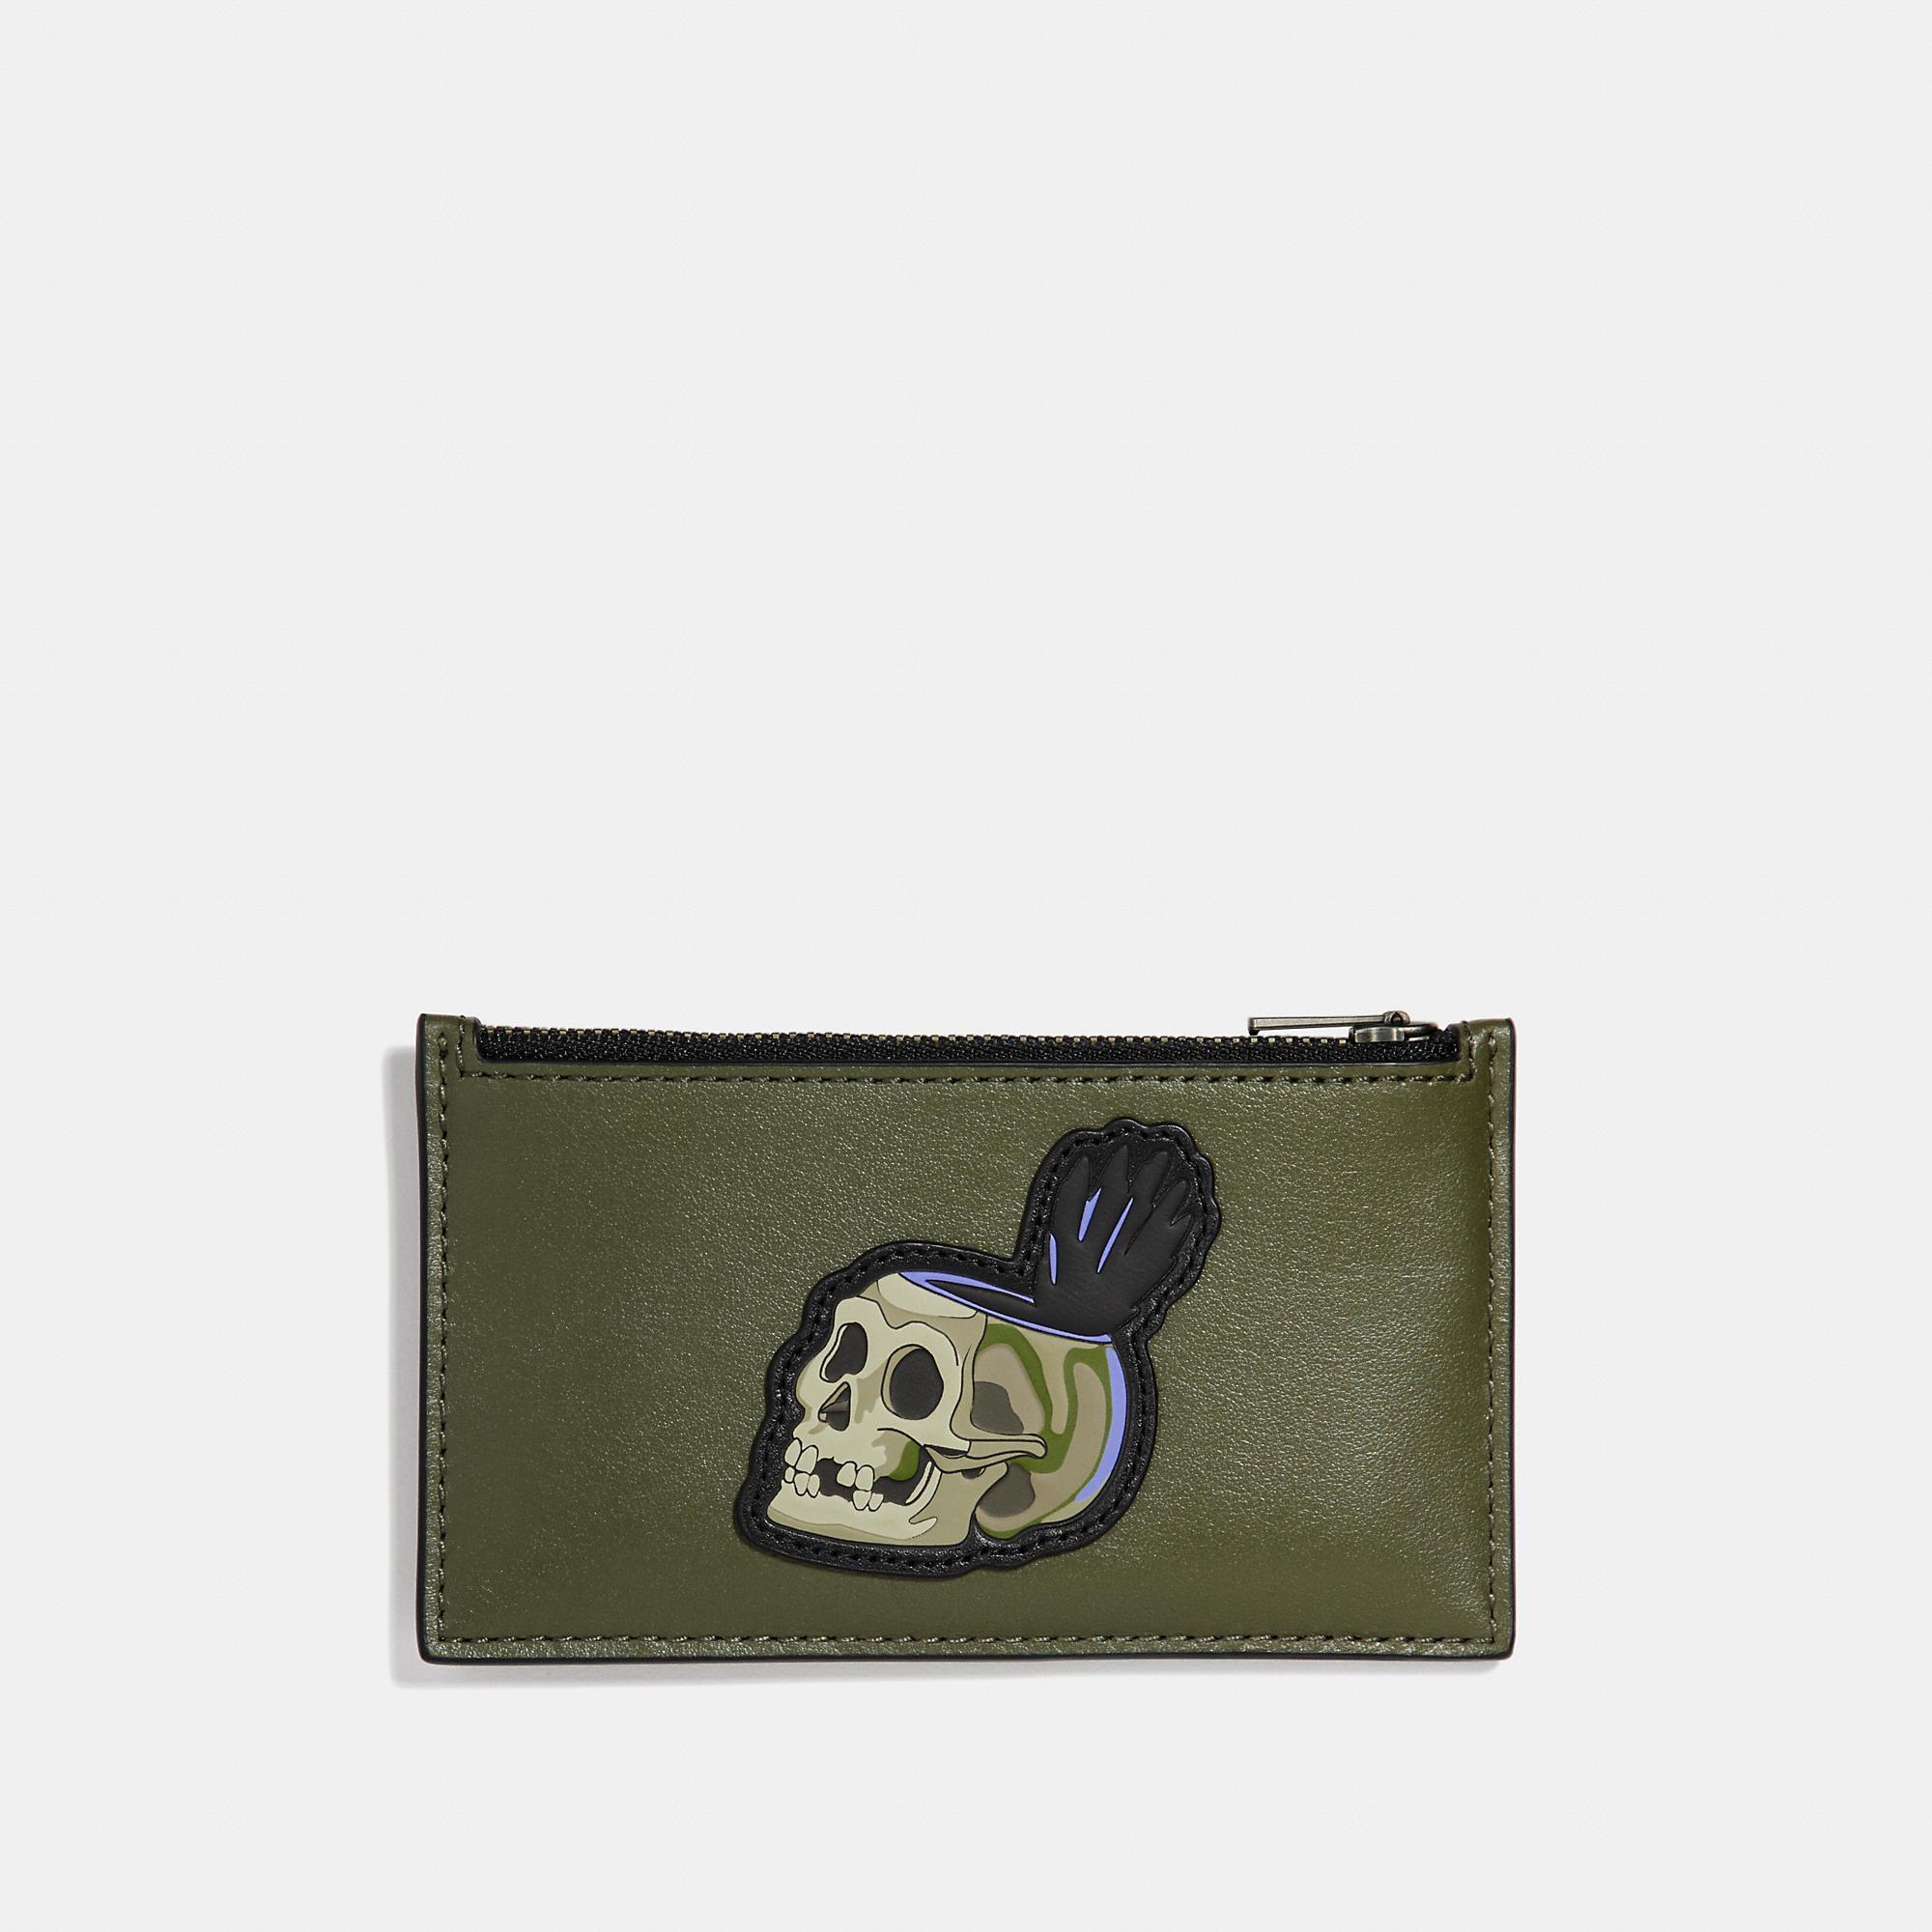 2f164fd7 Coach Disney X Zip Card Case With Skull - Men's in Army Green